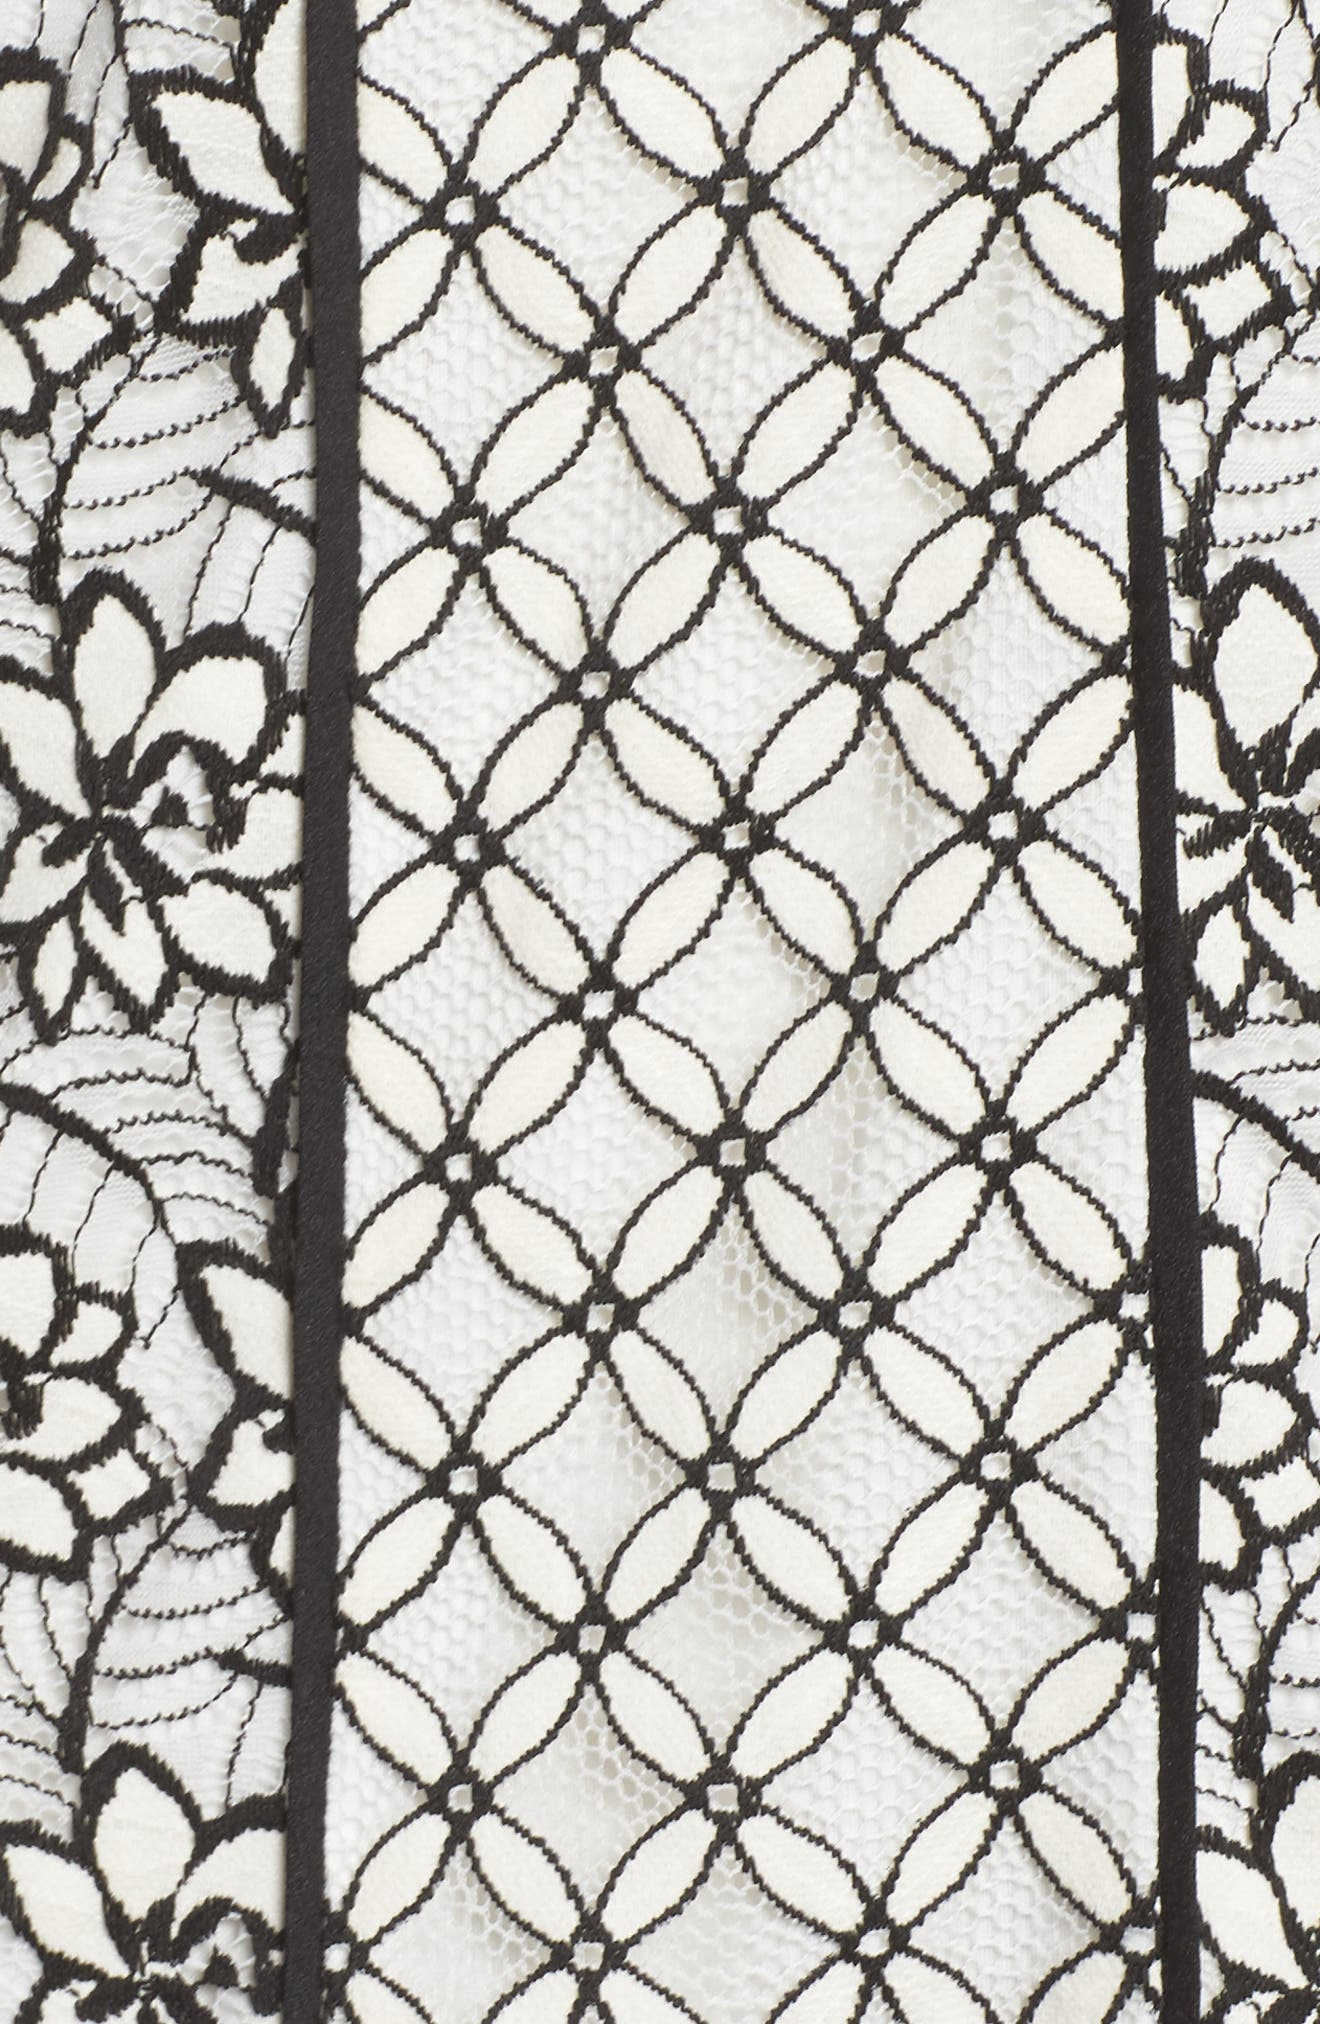 Lace Shift Dress,                             Alternate thumbnail 5, color,                             002